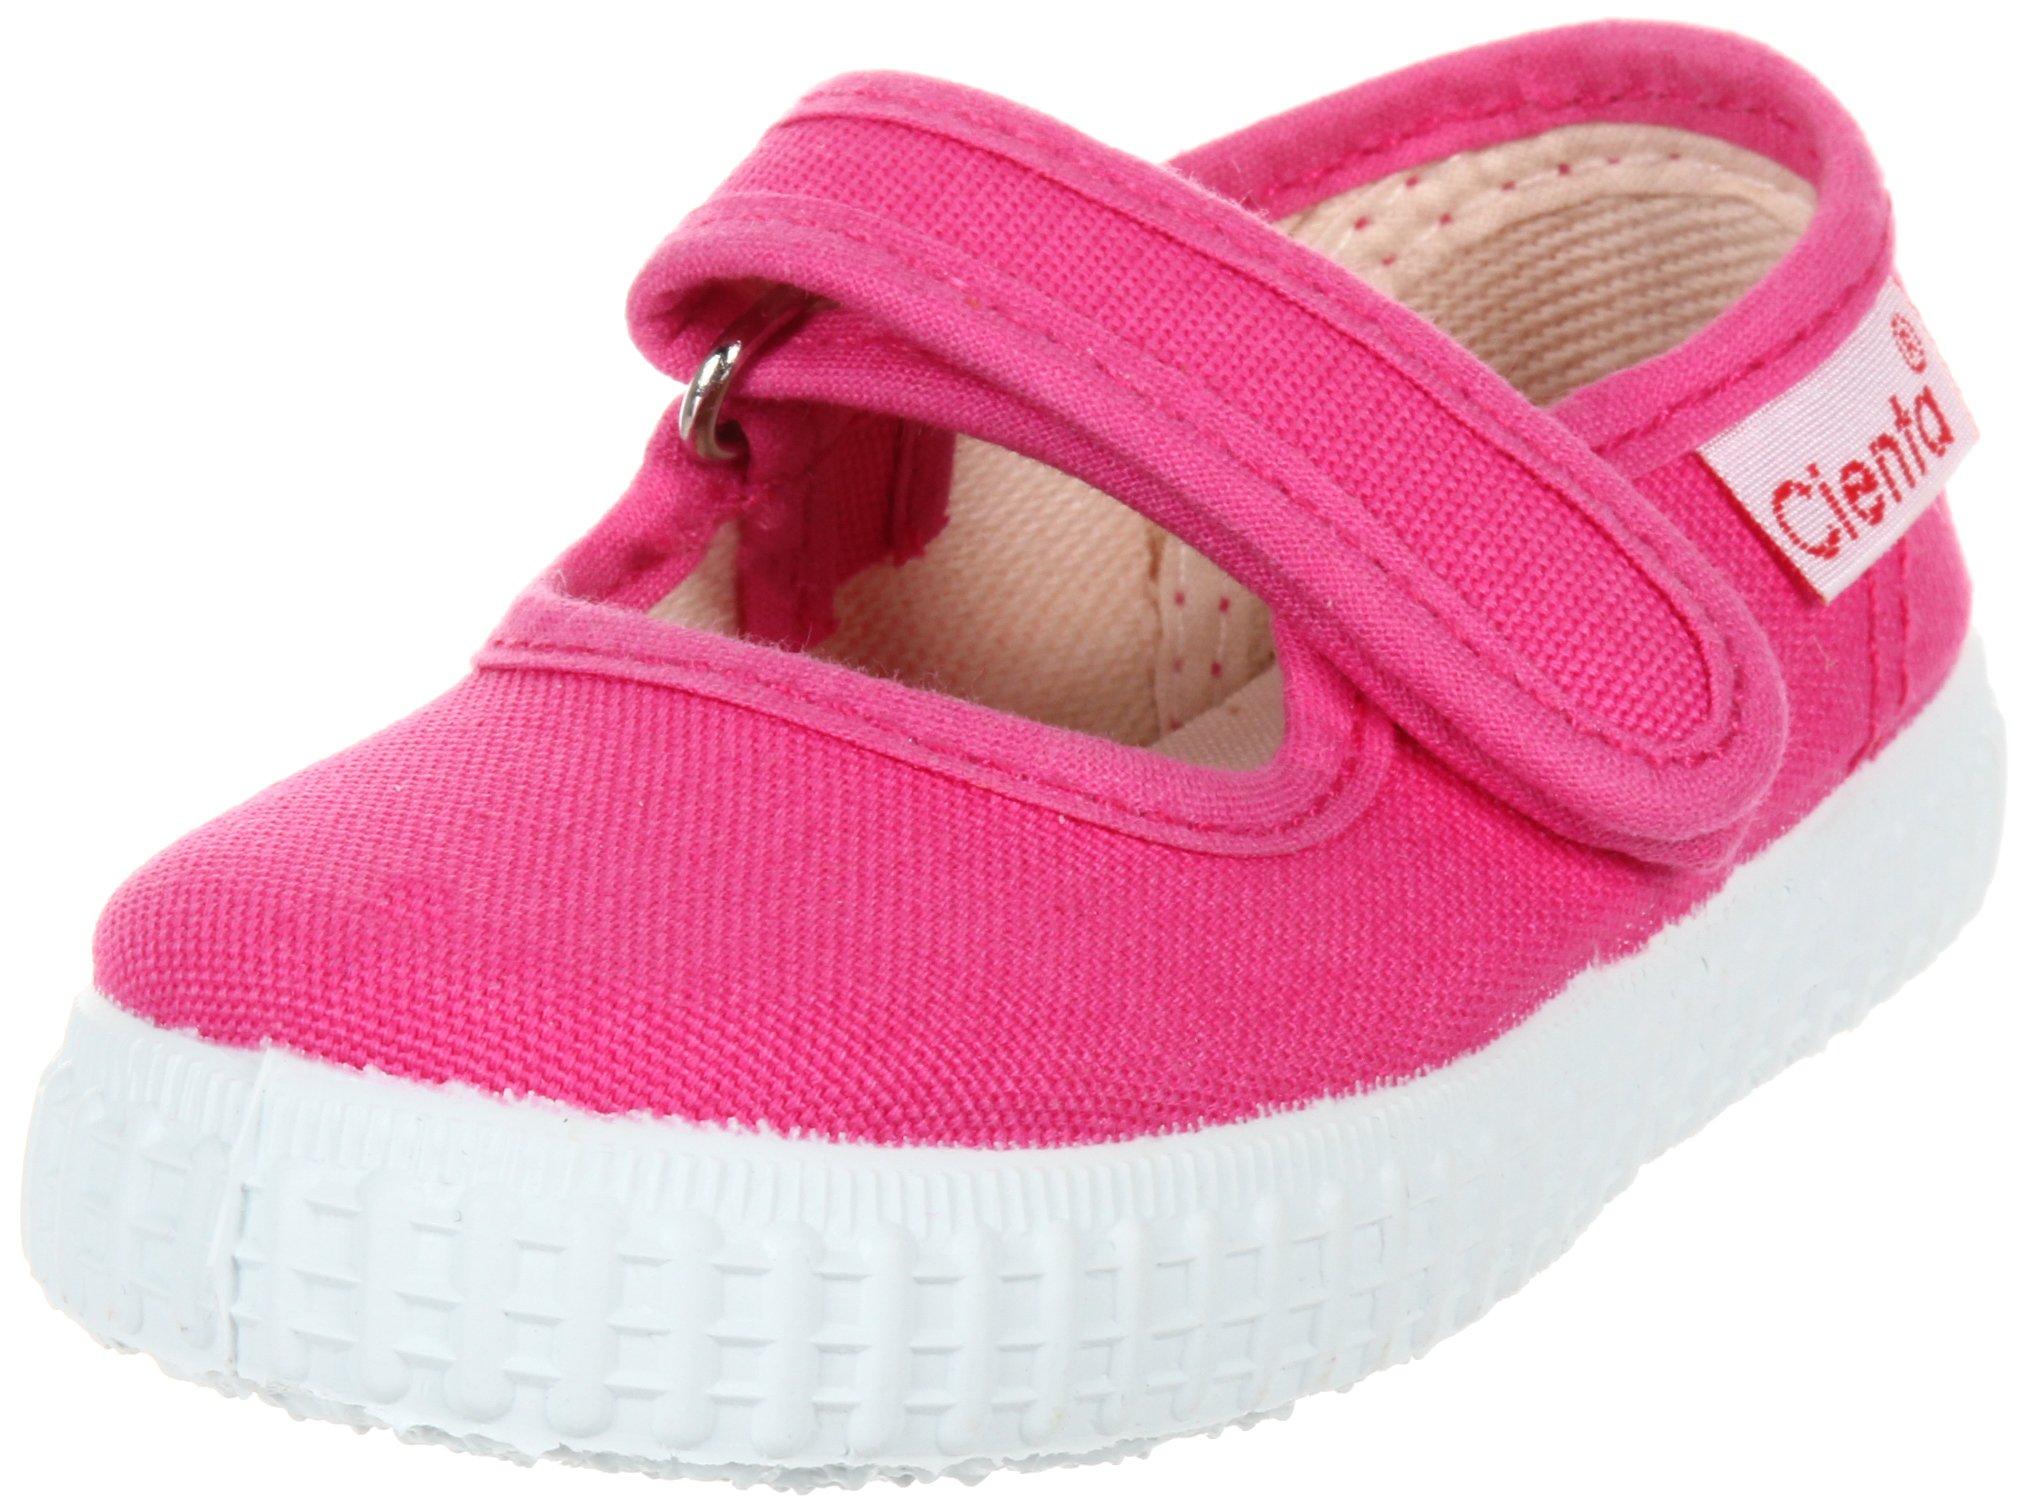 Cienta Girls Mary Jane Shoe, Fuchsia, 19 M EU / 3.5 M US Toddler by Cienta (Image #1)